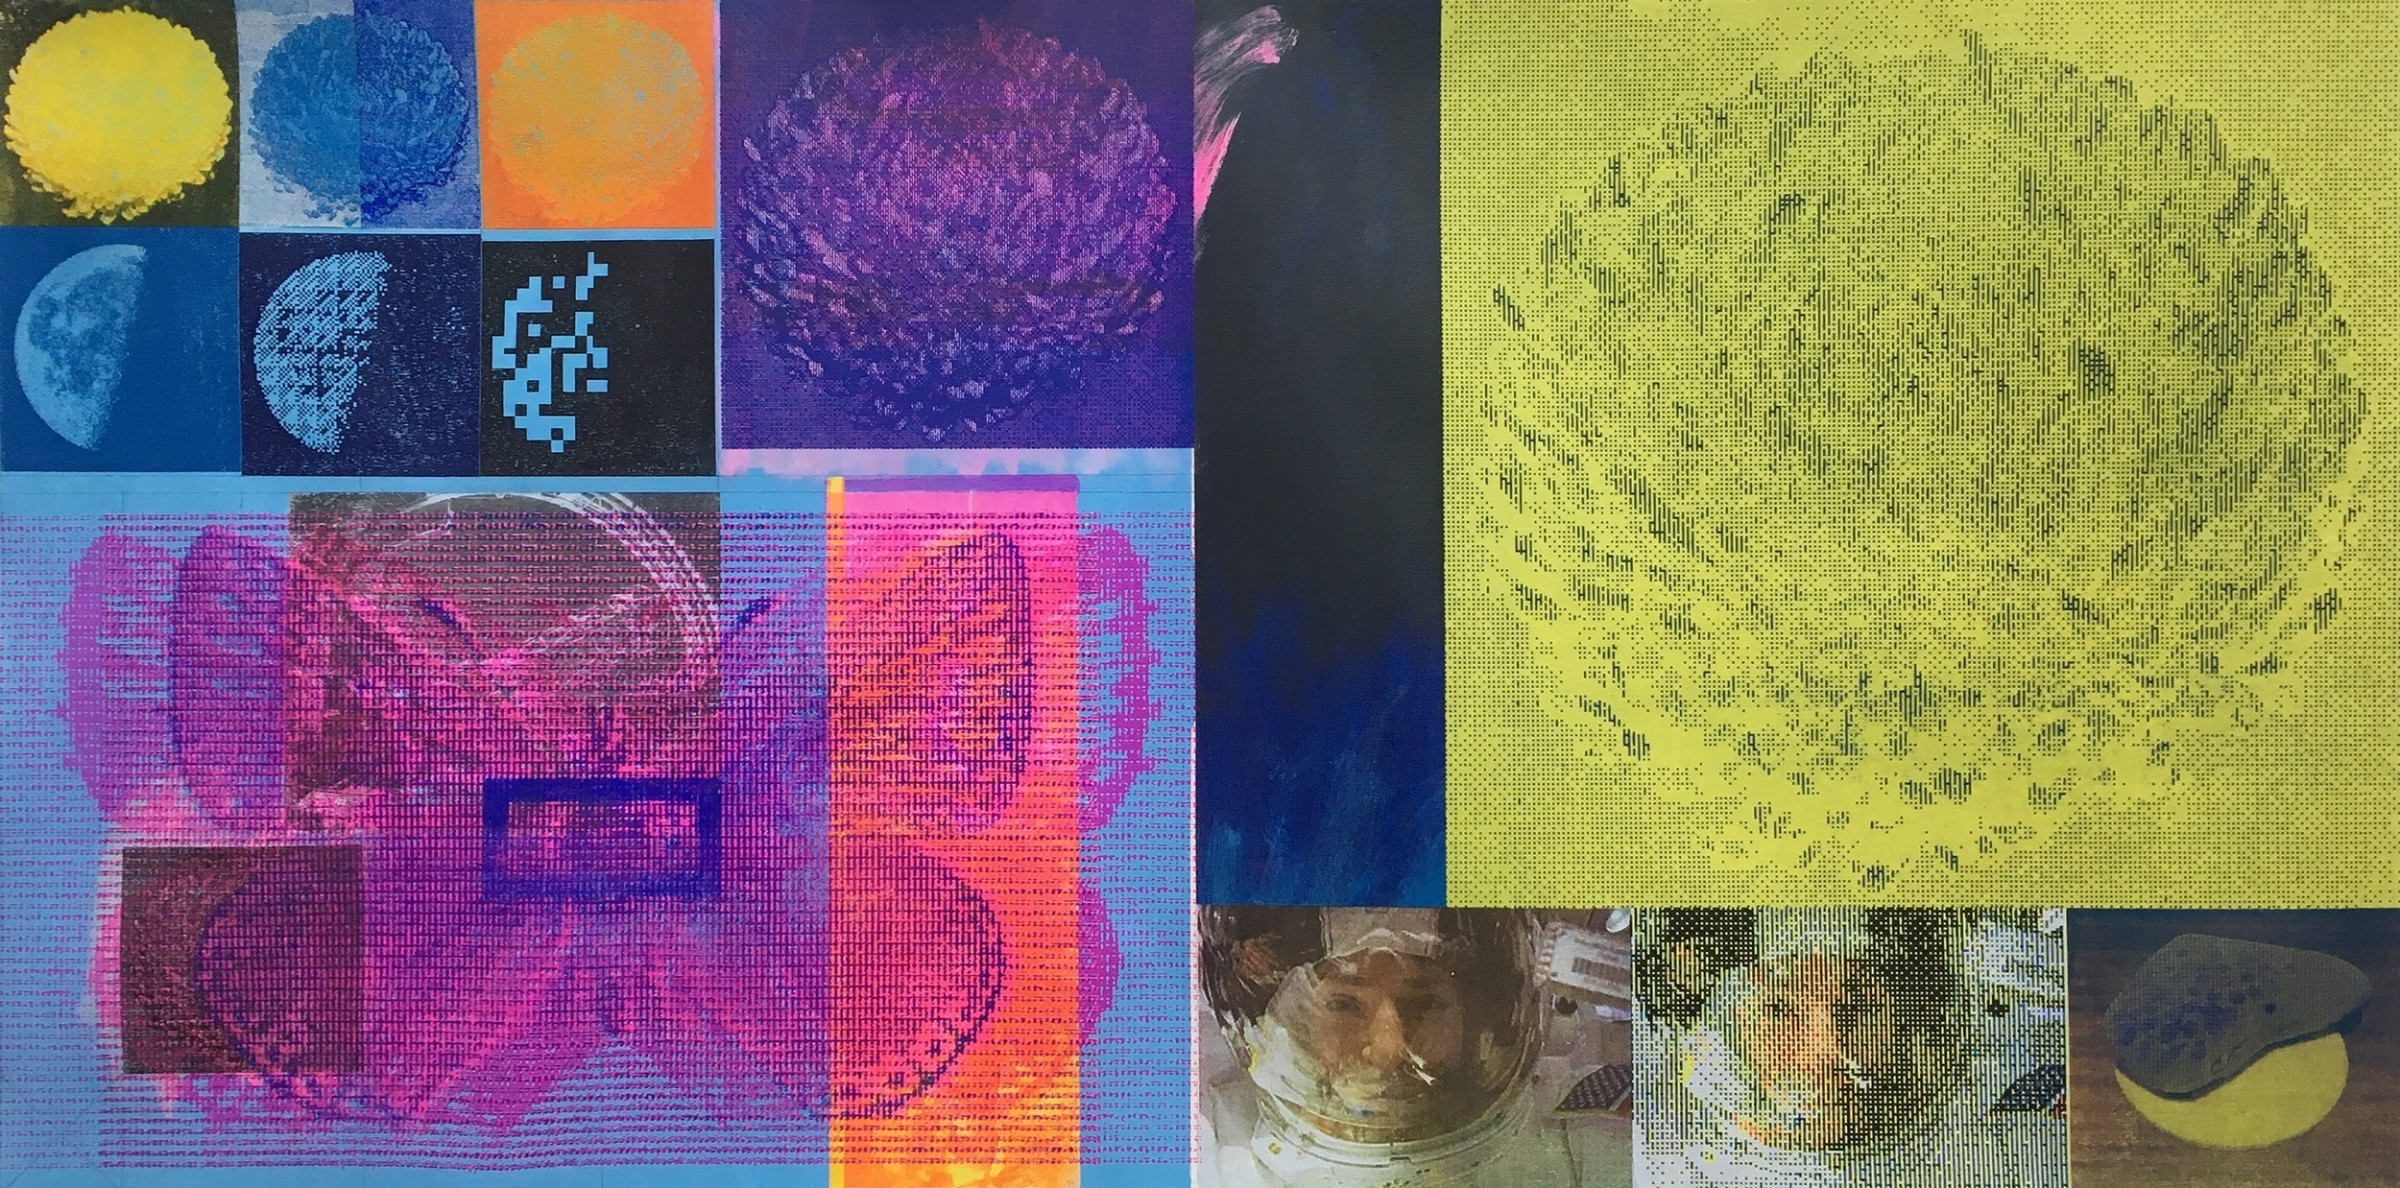 "<span class=""link fancybox-details-link""><a href=""/exhibitions/20/works/artworks_standalone10834/"">View Detail Page</a></span><div class=""artist""><span class=""artist""><strong>Libby Lloyd ARE</strong></span></div><div class=""title""><em>Artemis Stage 1</em></div><div class=""medium"">screenprint on canvas<br></div><div class=""dimensions"">100 x 200 cm image size<br></div><div class=""edition_details"">unique</div>"